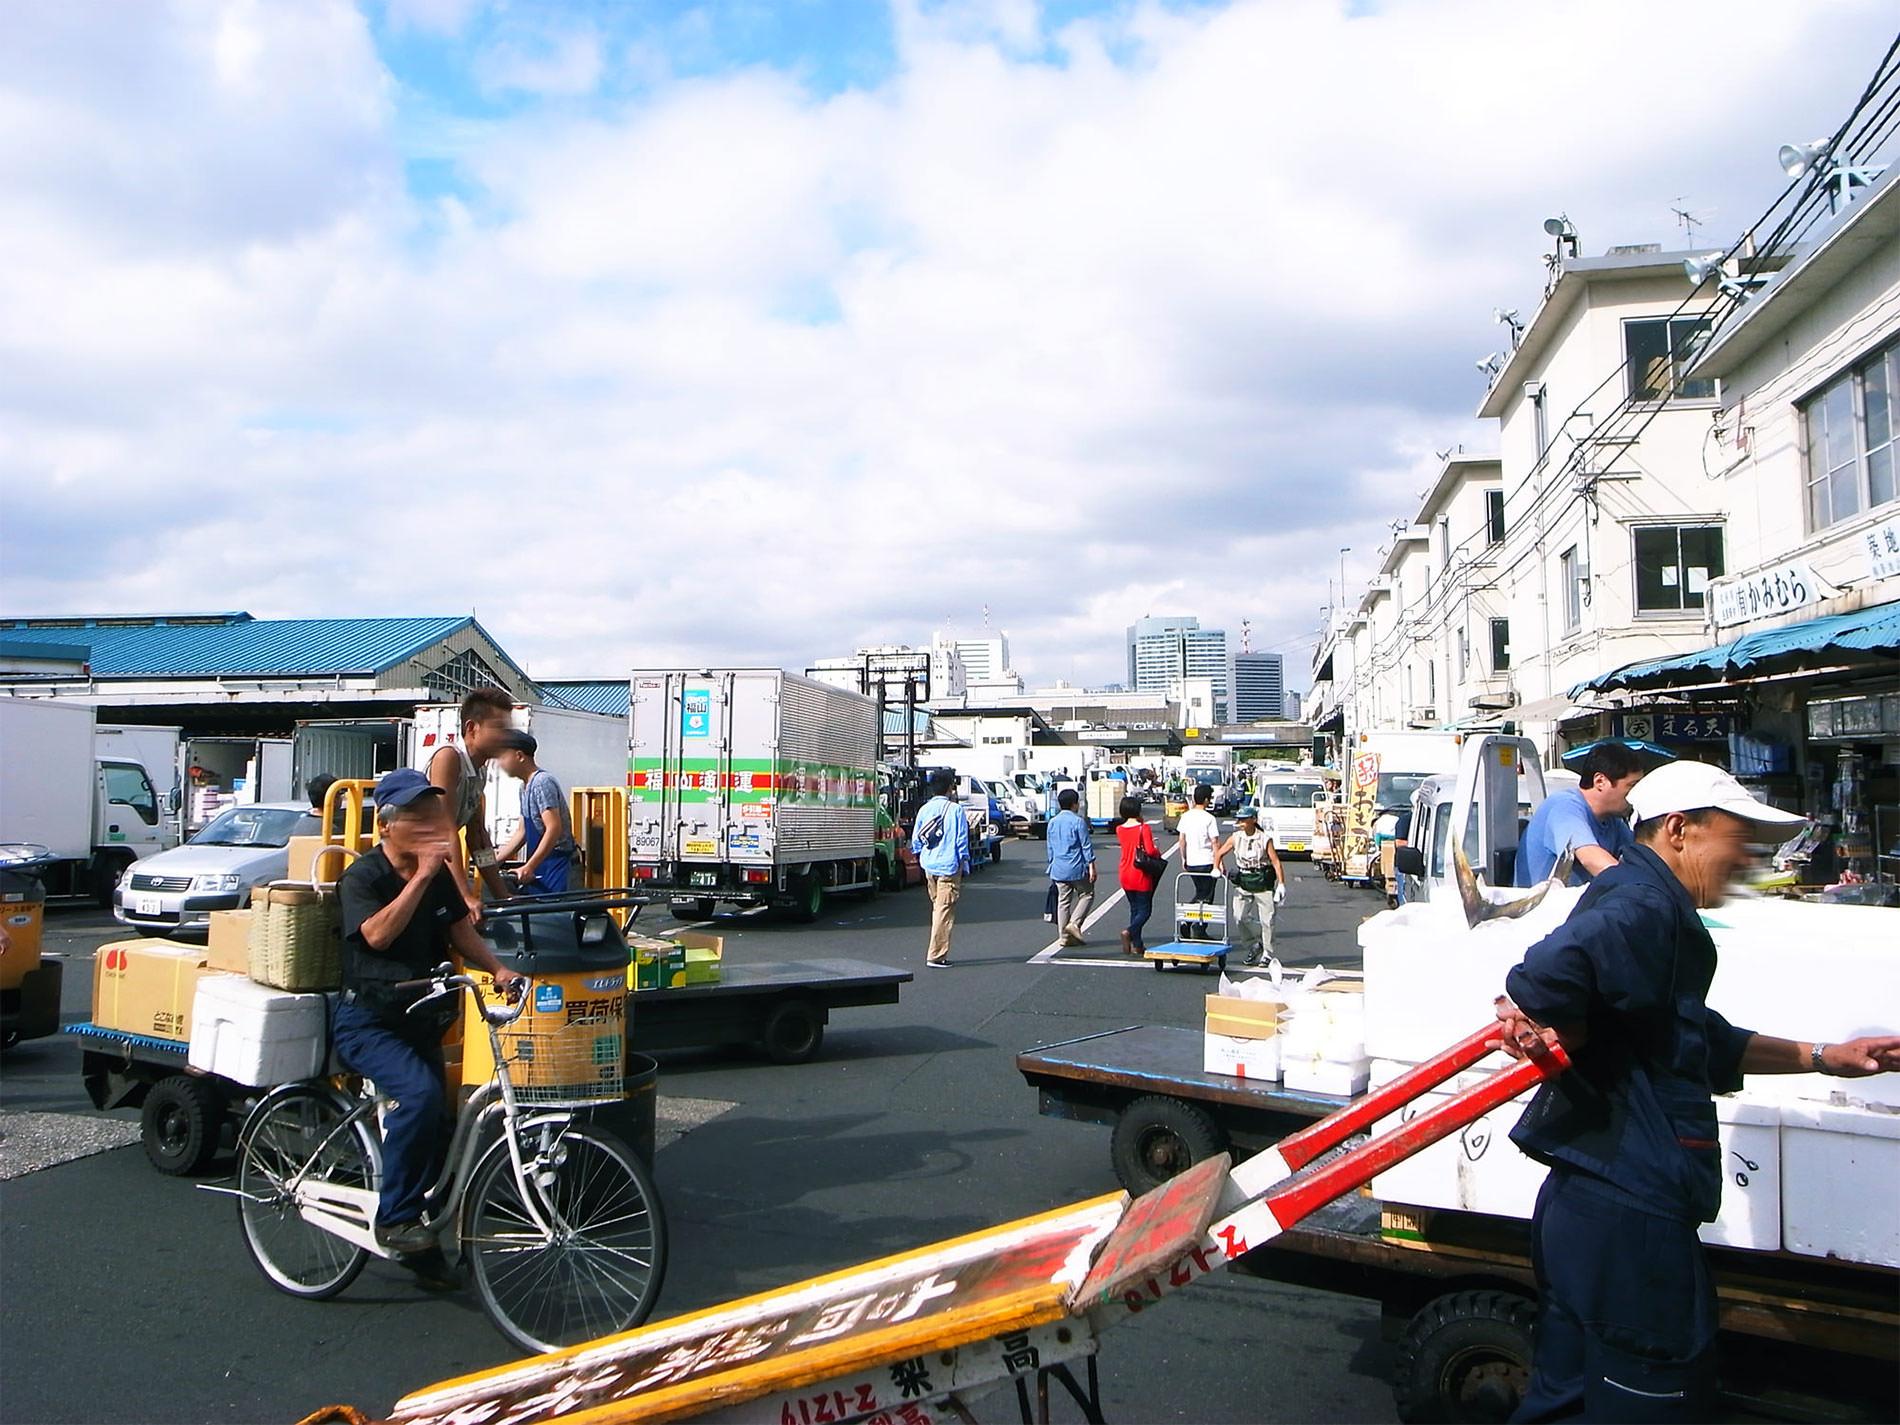 築地市場 2015   Tsukiji Market Tokyo 2015